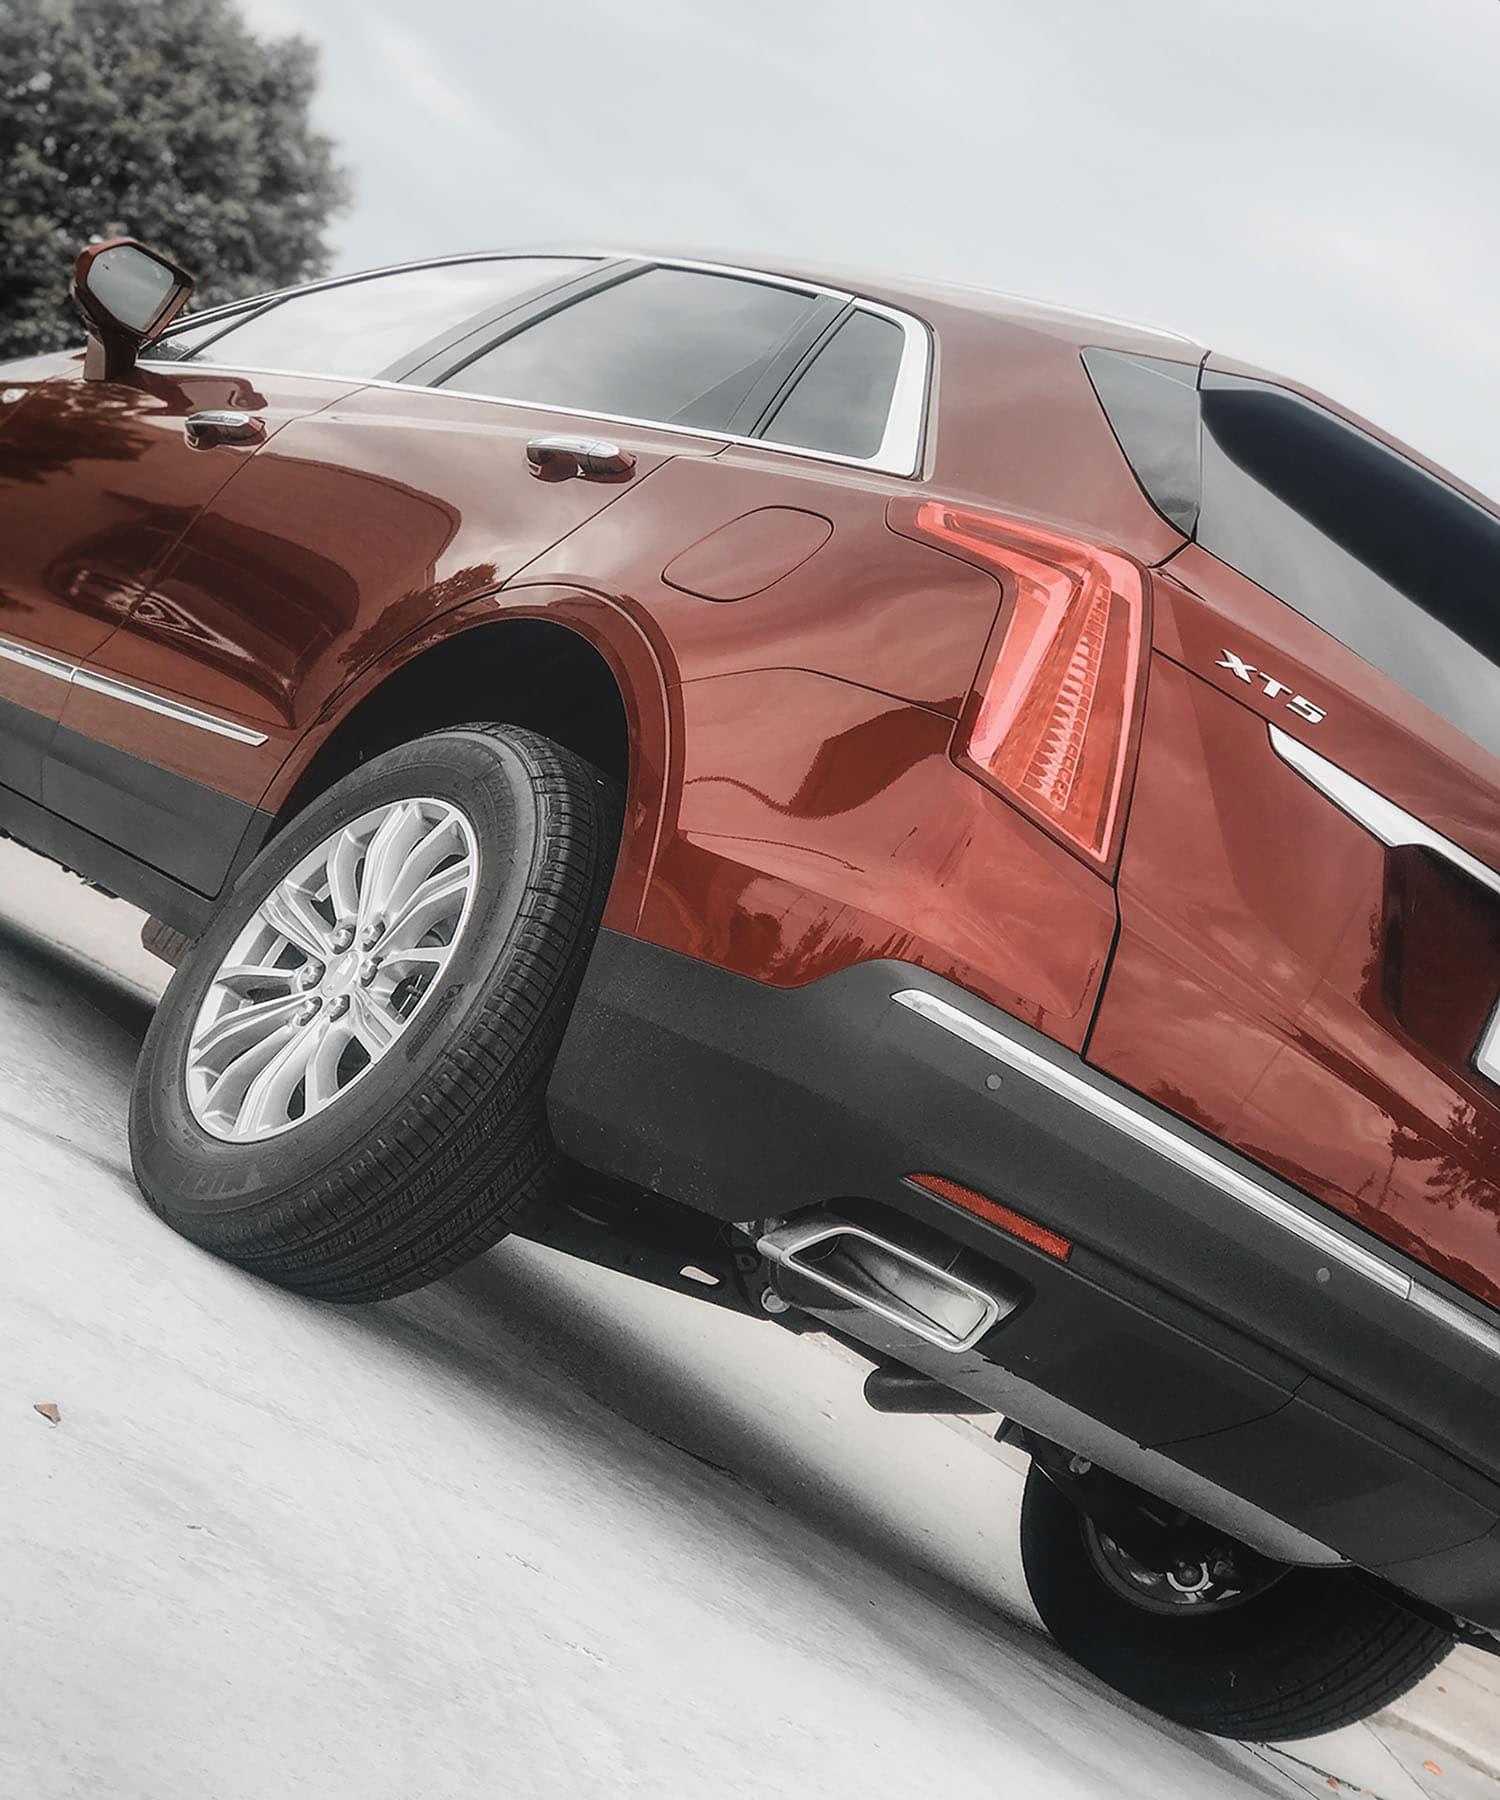 Willis Weekend - Cadillac XT5 | Willis Automotive